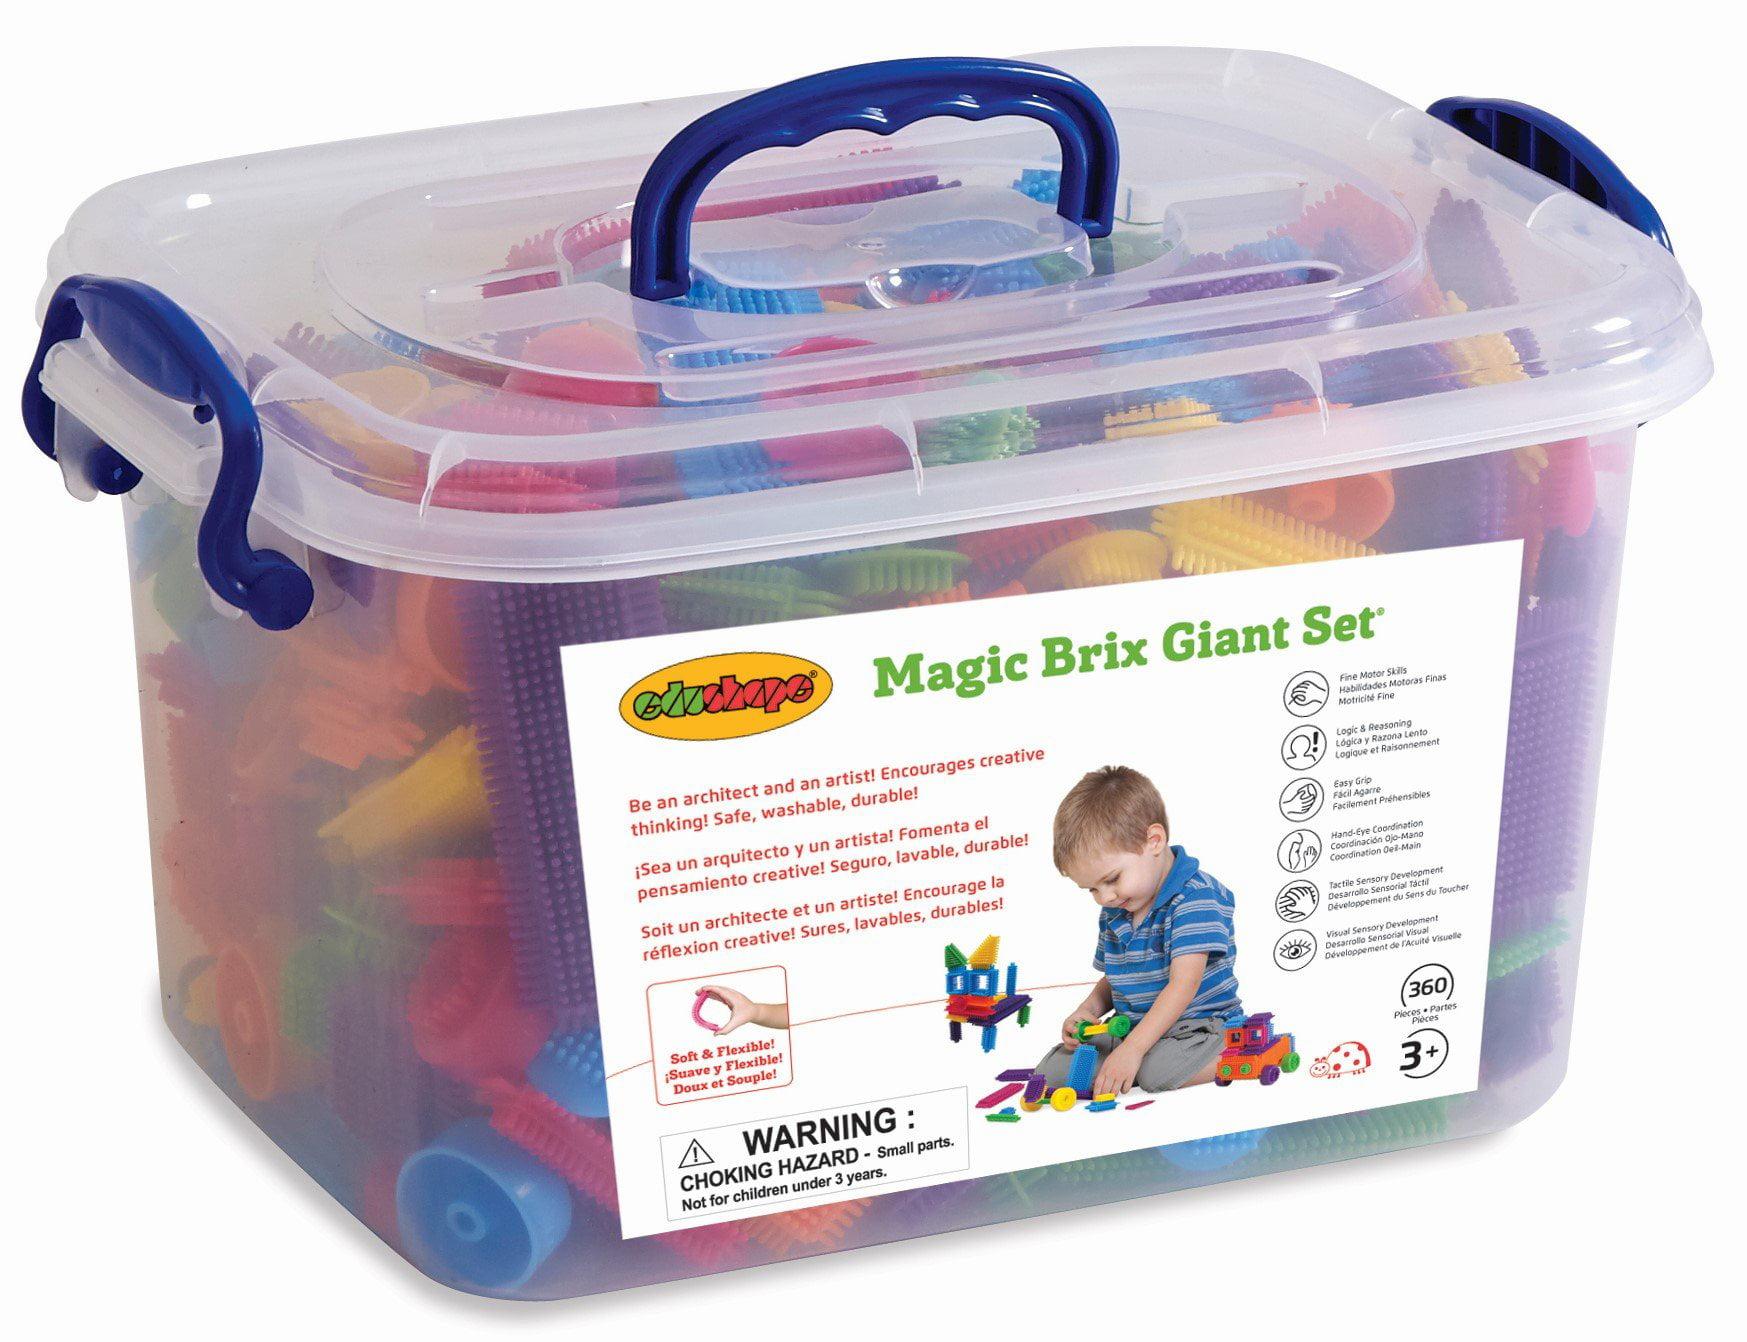 Edushape Magic Brix Giant Set, 360 Piece by